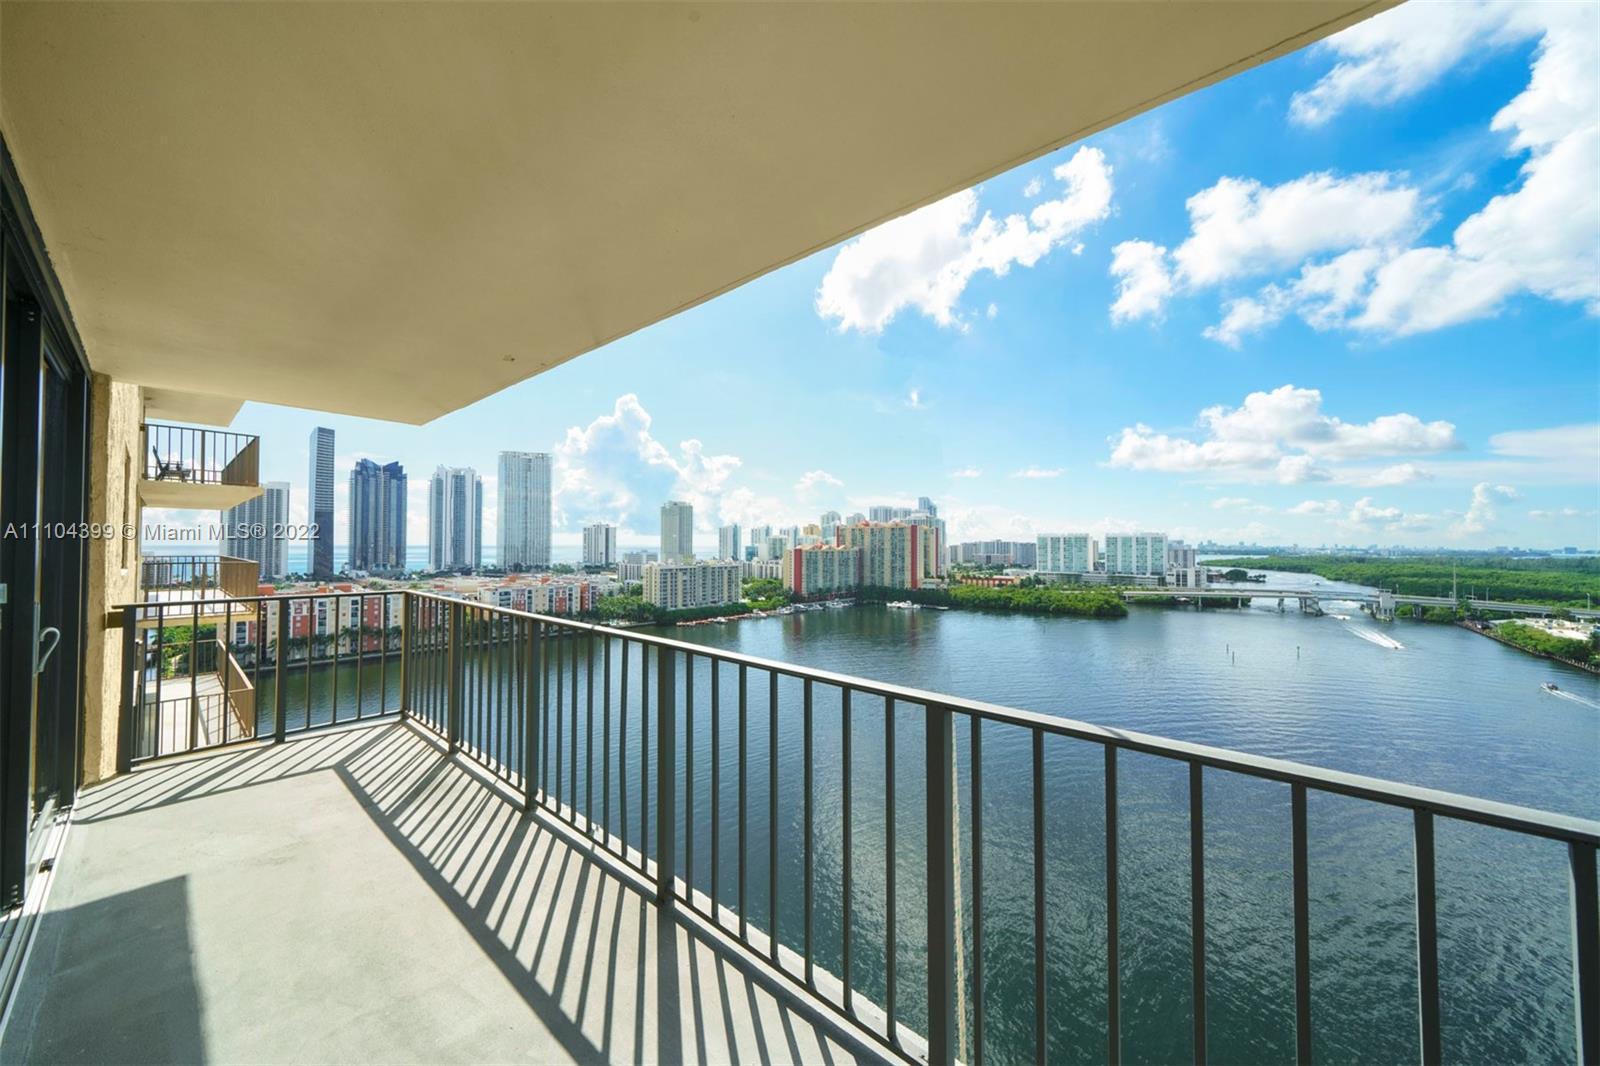 Winston Tower 700 #2101 - 290 174 Street #2101, Sunny Isles Beach, FL 33160